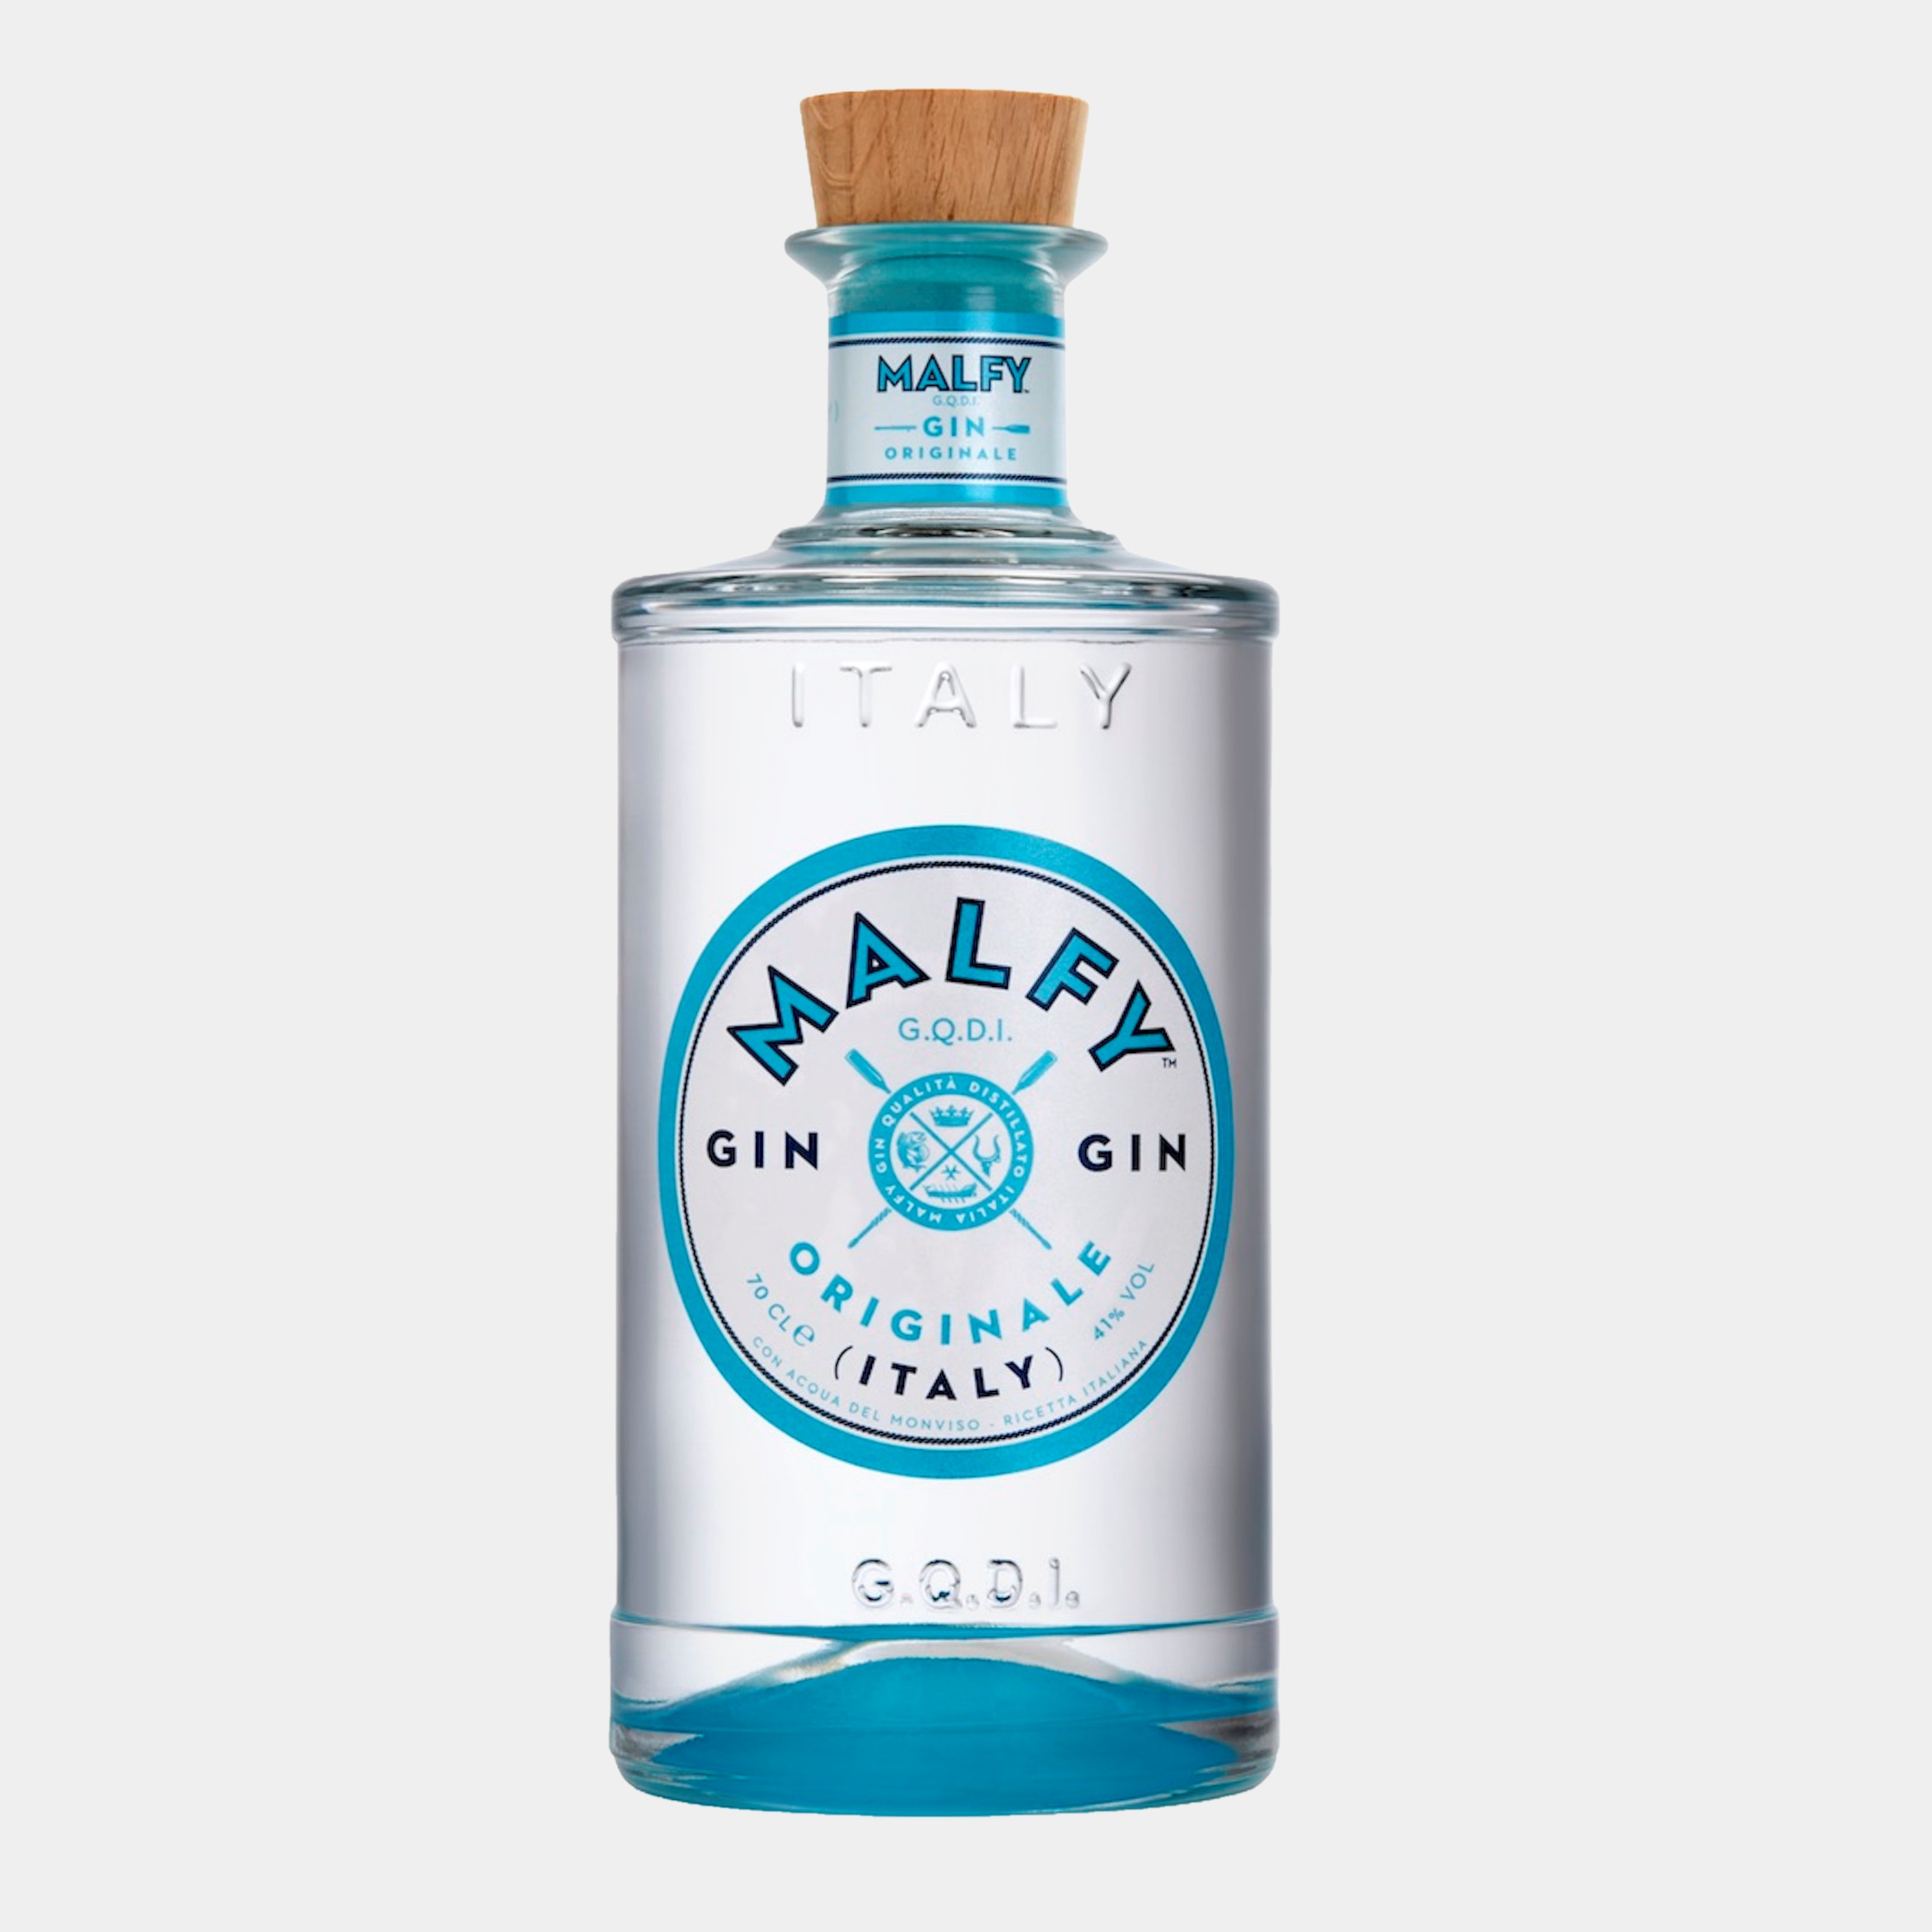 Malfy Gin Originale 0.7L 41% Alk. ginobility.de